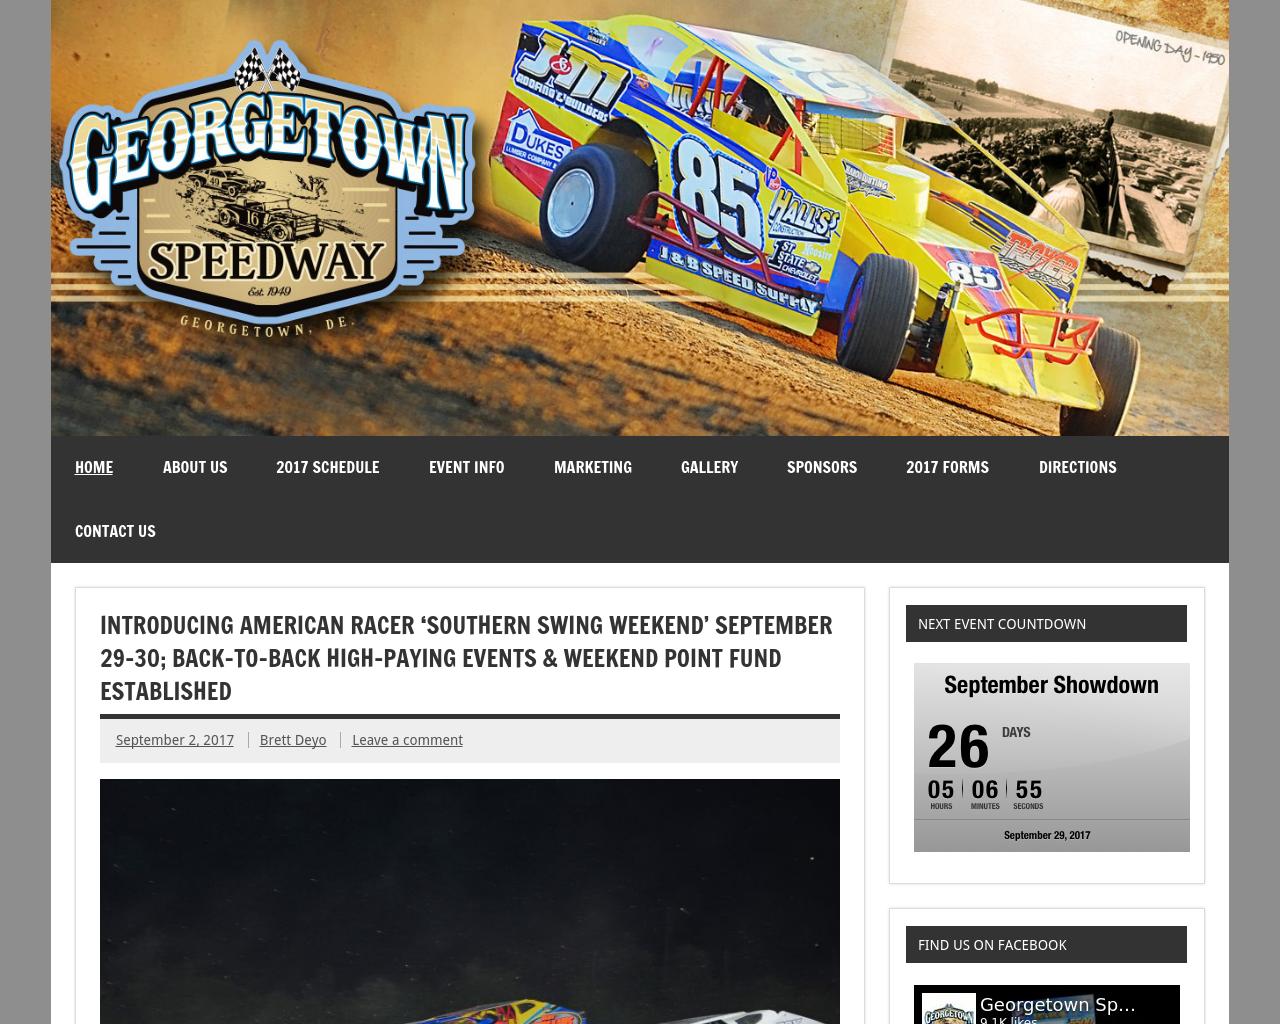 Georgetown-Speedway-Advertising-Reviews-Pricing